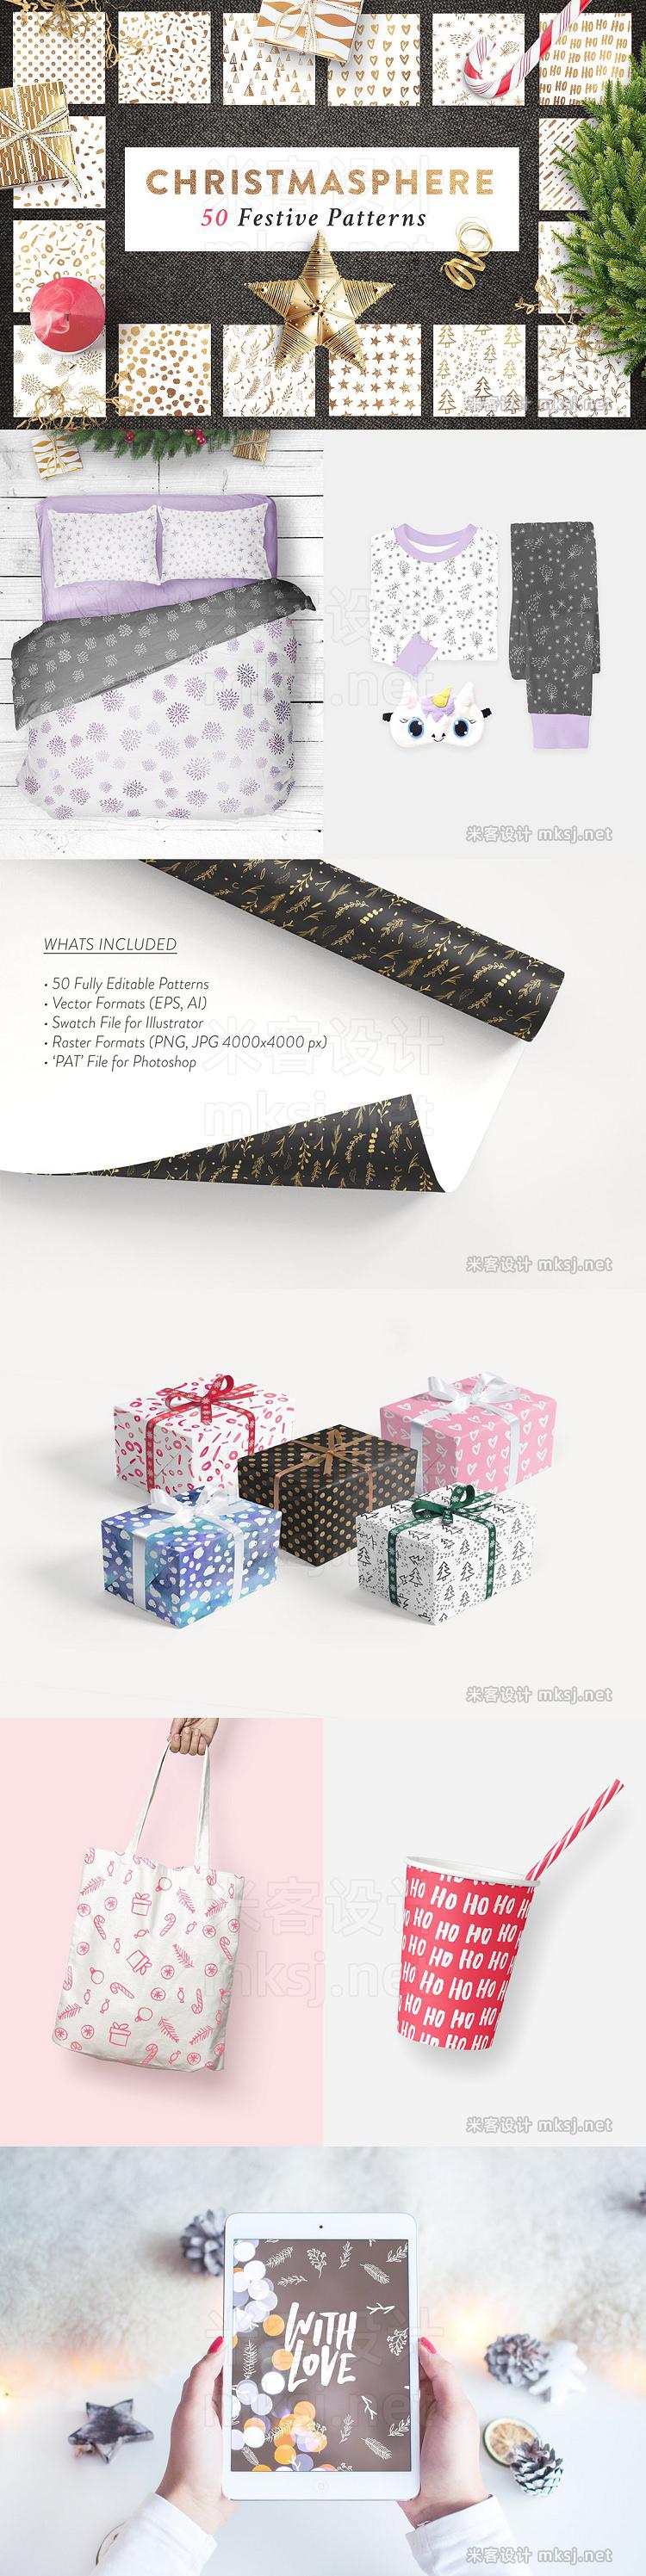 png素材 50 Christmas Seamless Patterns